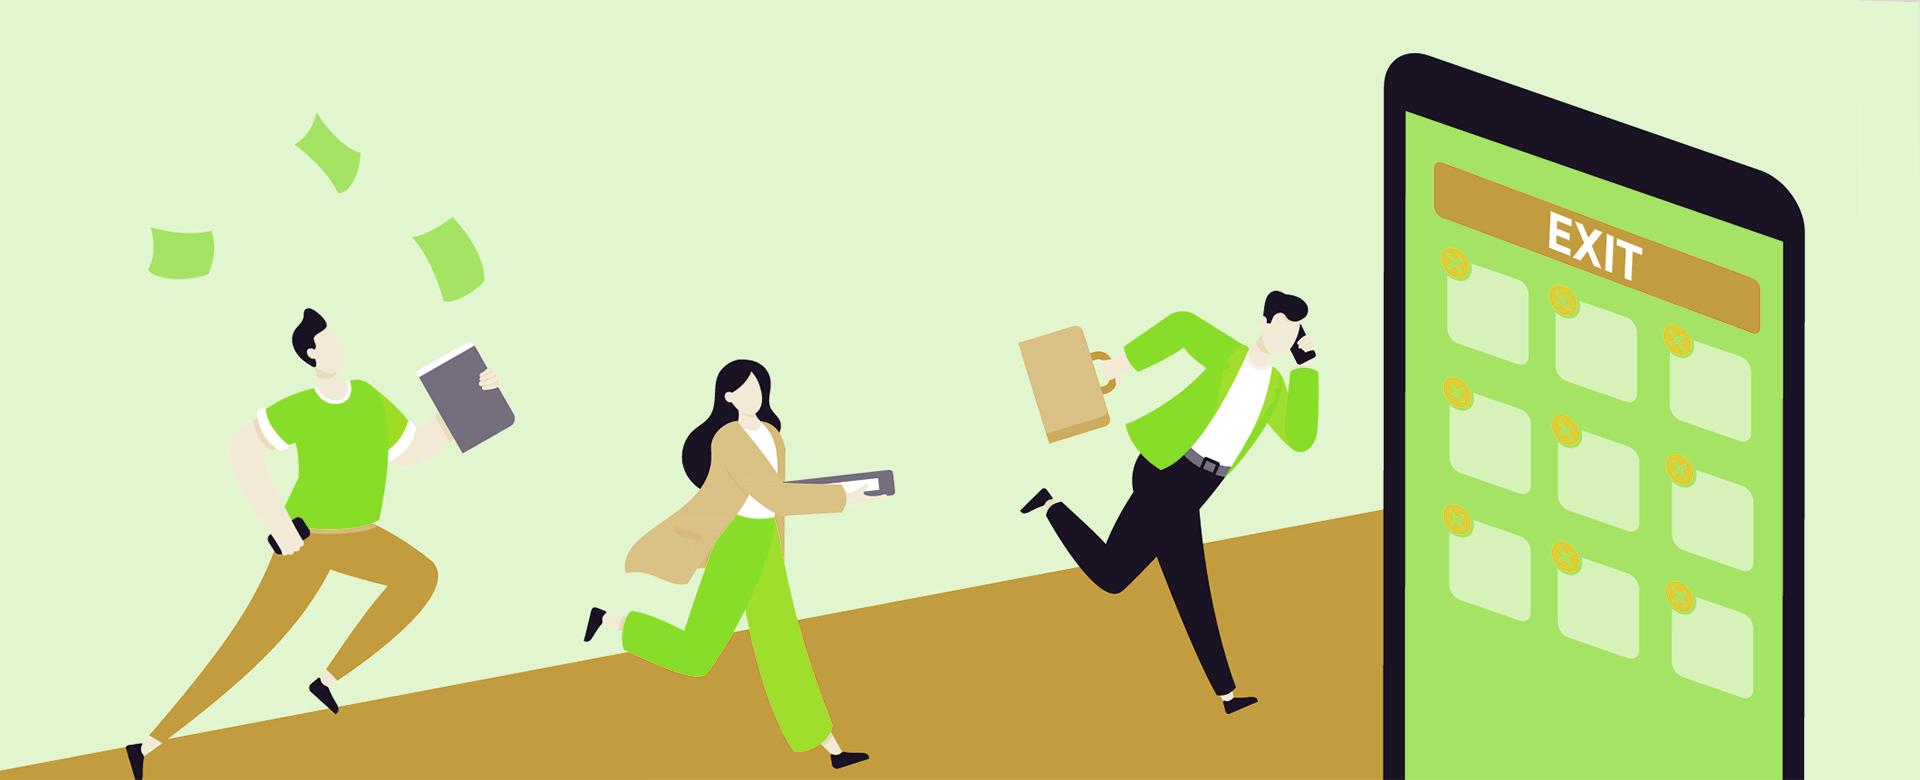 How Customer Churn Analysis Works